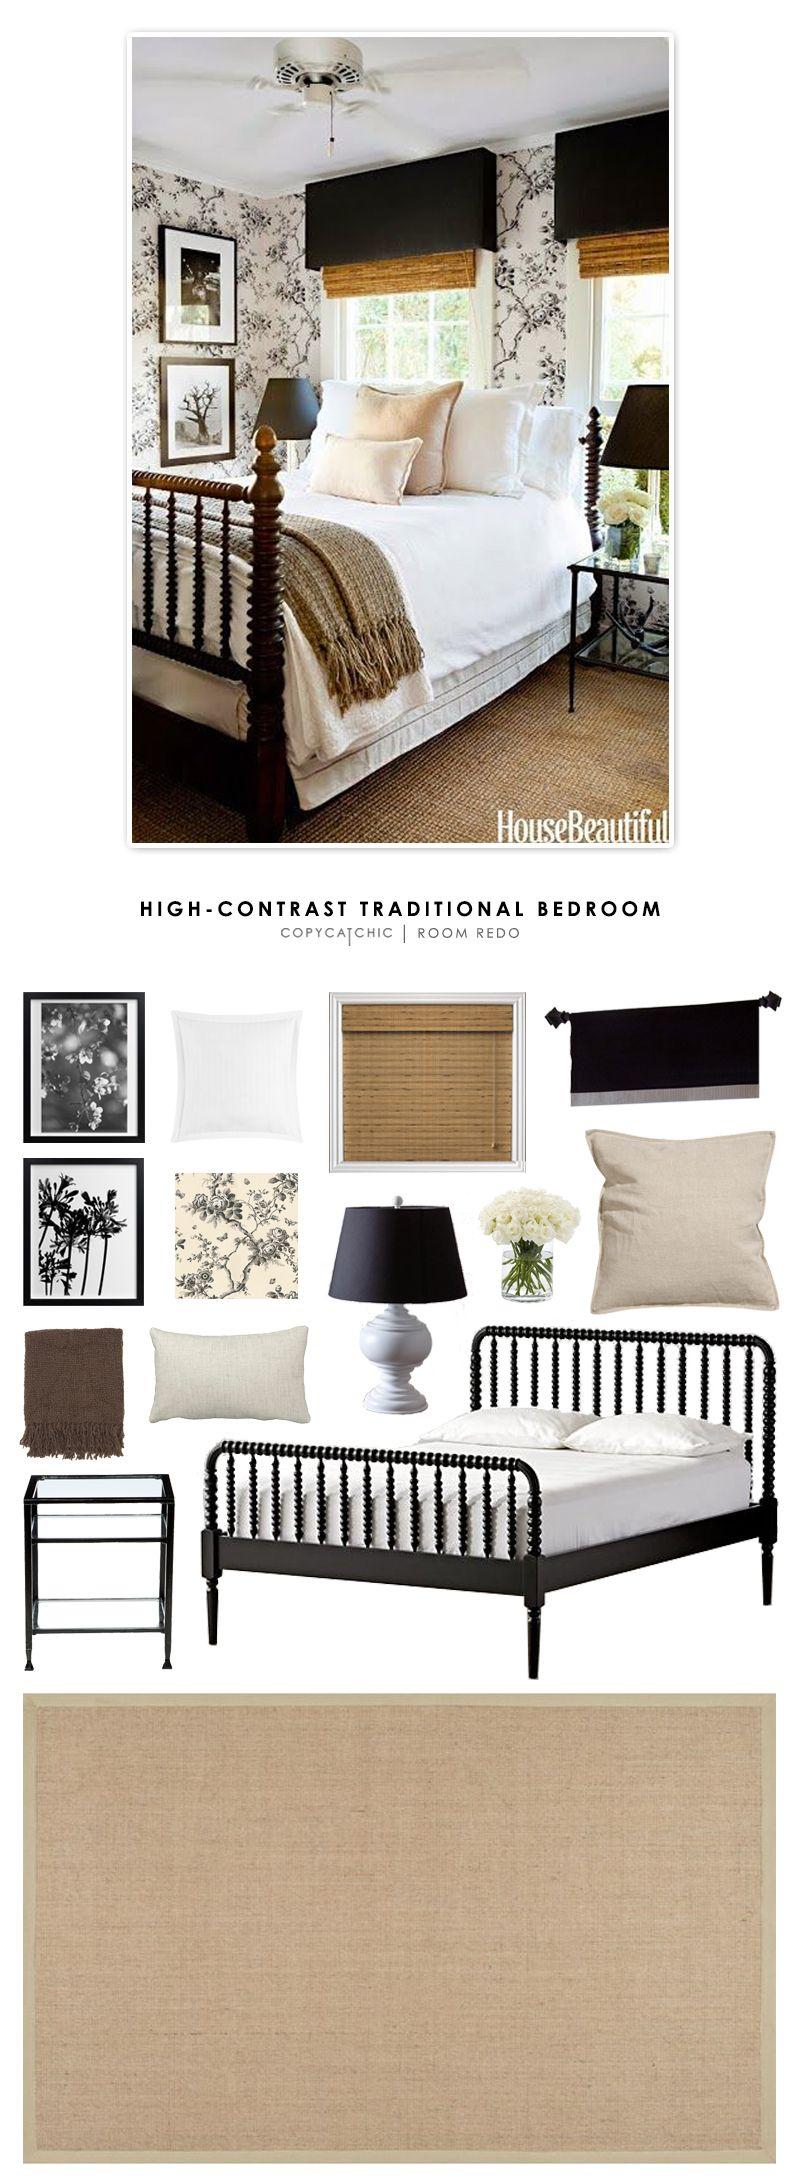 Tr traditional bedroom designs for couples - Copy Cat Chic Room Redo Design Bedroombedroom